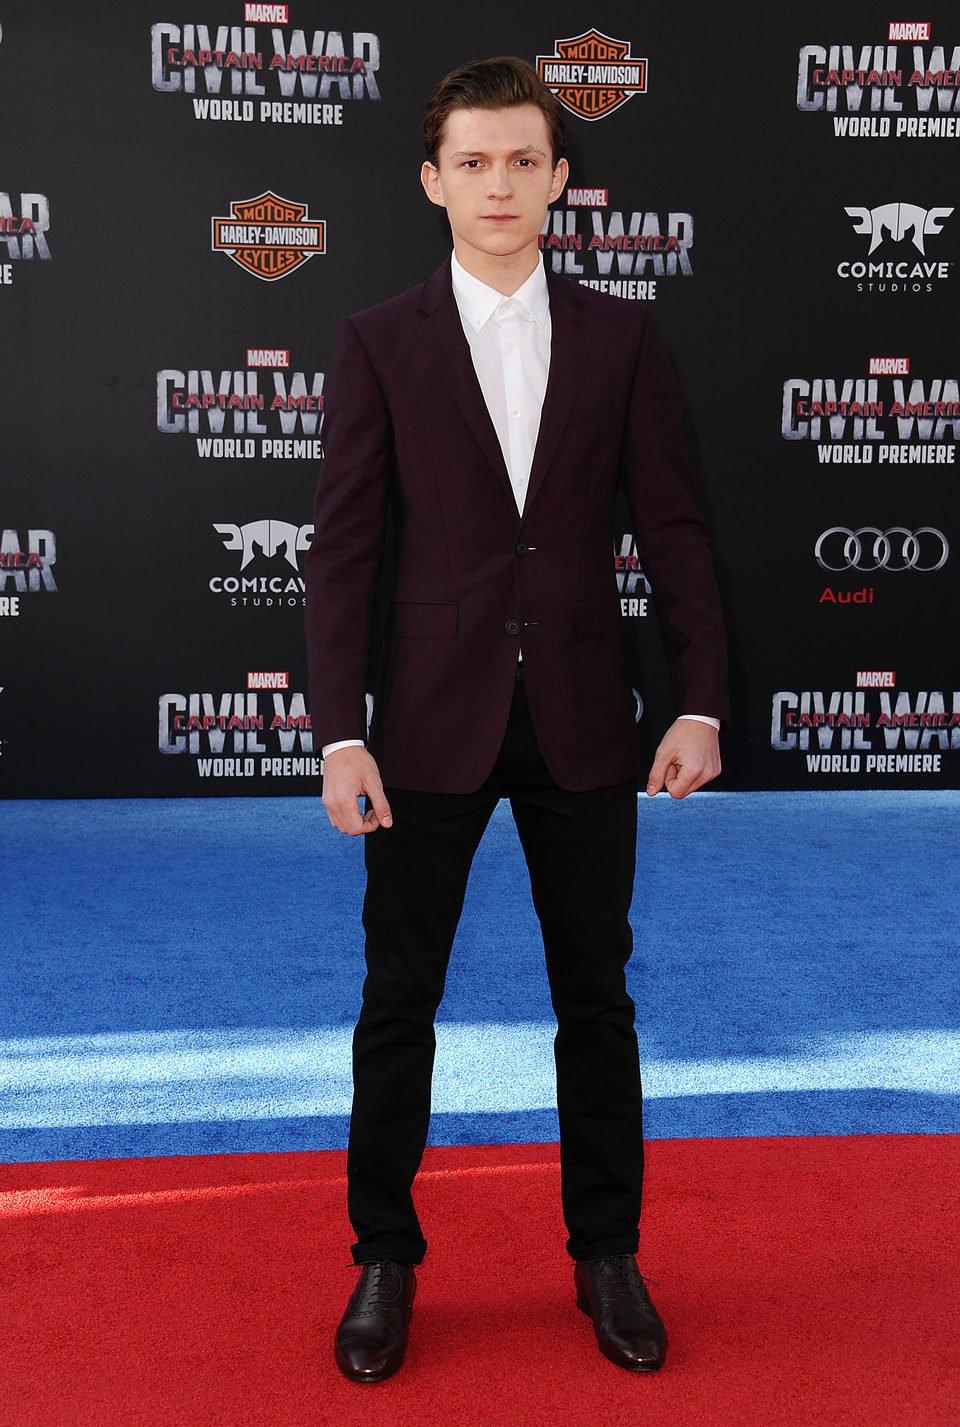 Tom Holland at 'Captain America: Civil War' World Premiere